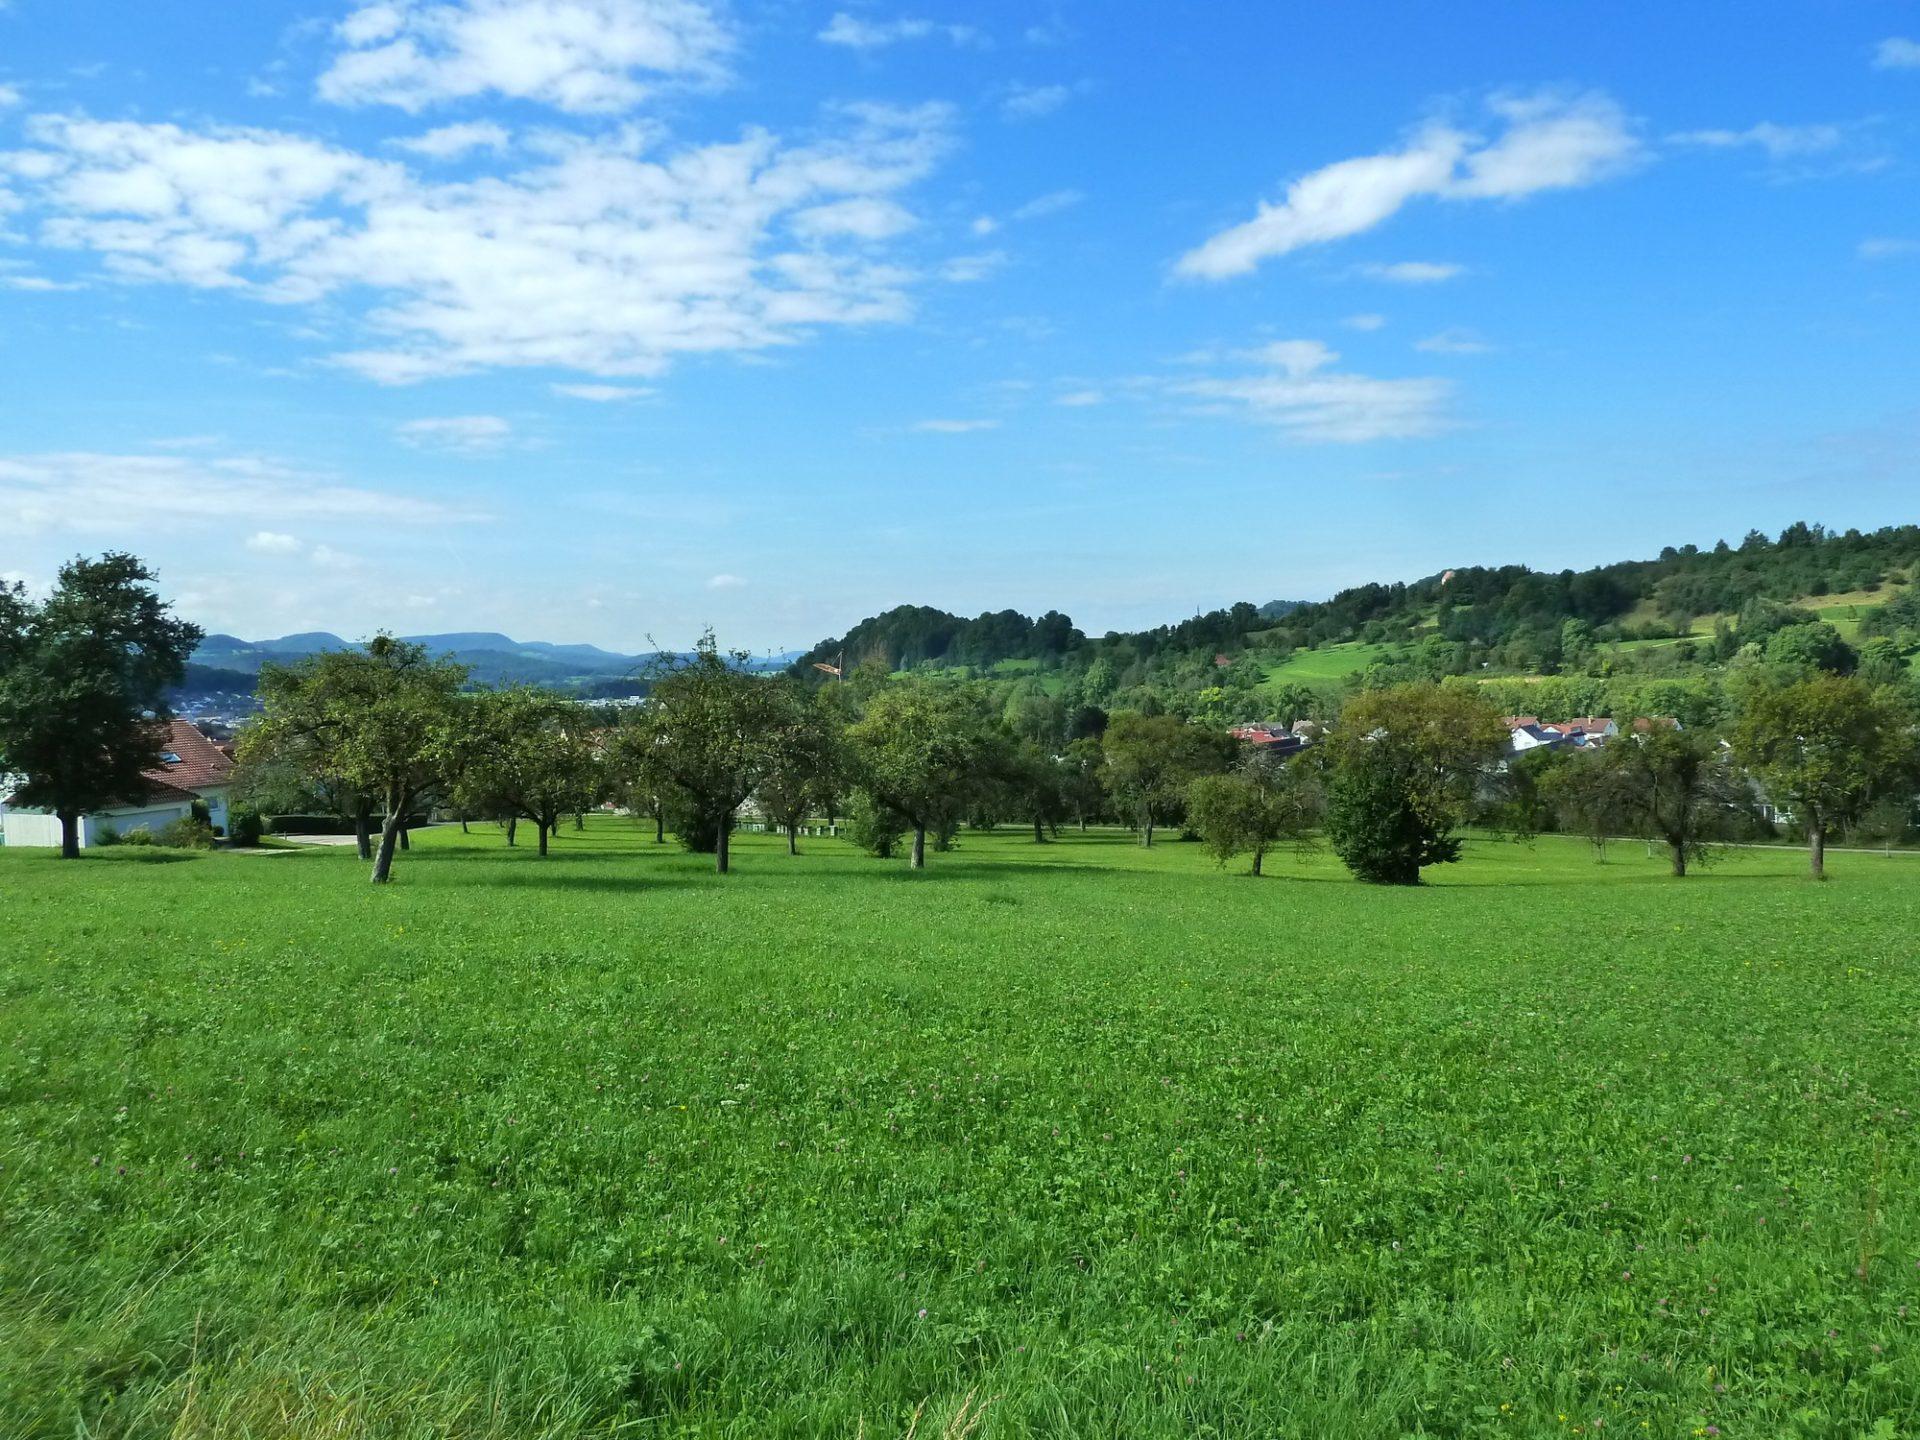 Mittlere Fils - Lautertal, Landschaftsplan